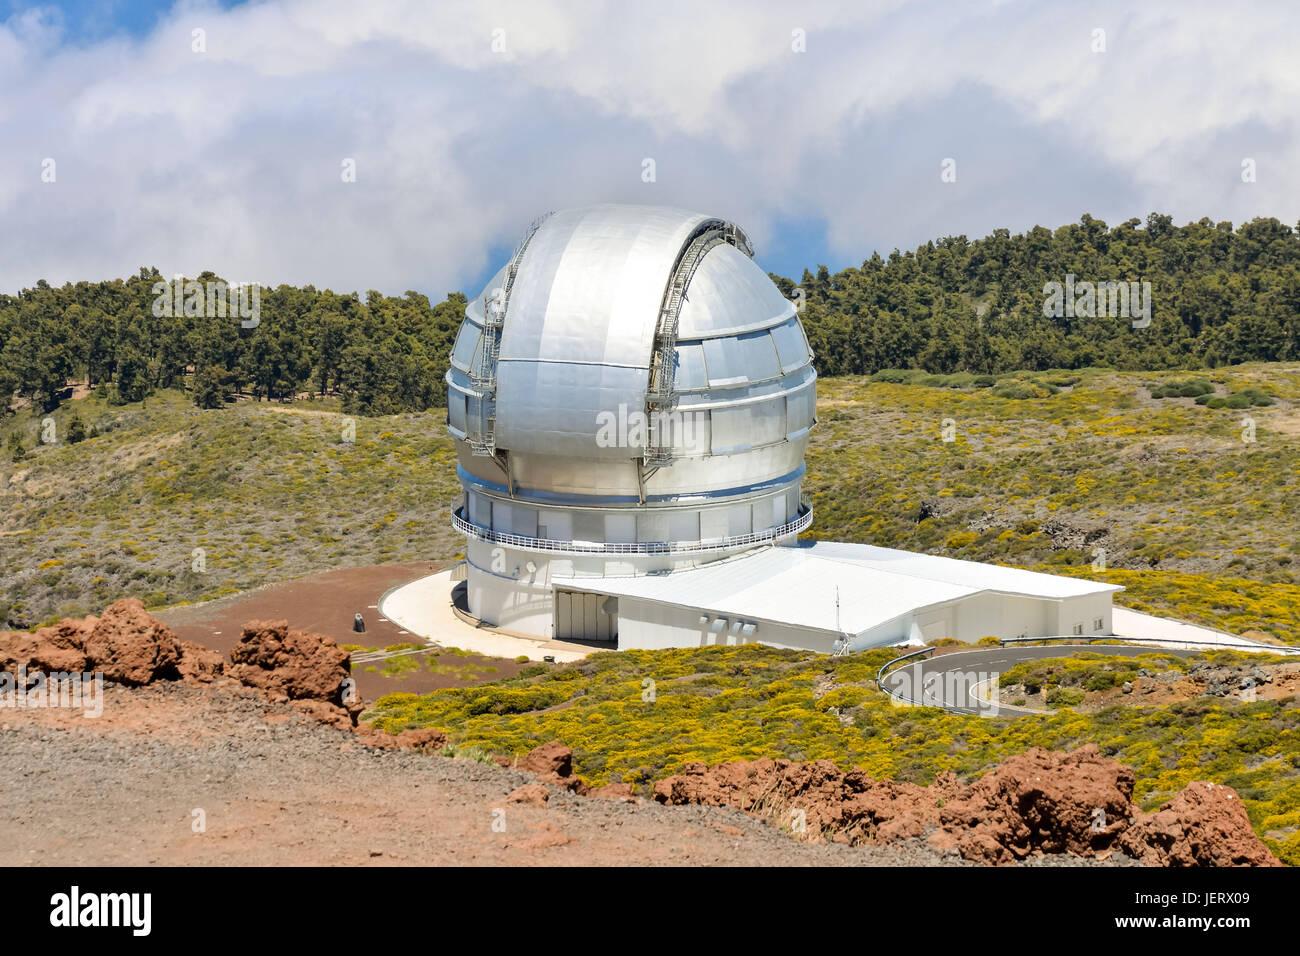 Astronomisches observatorium teleskop stockfoto bild